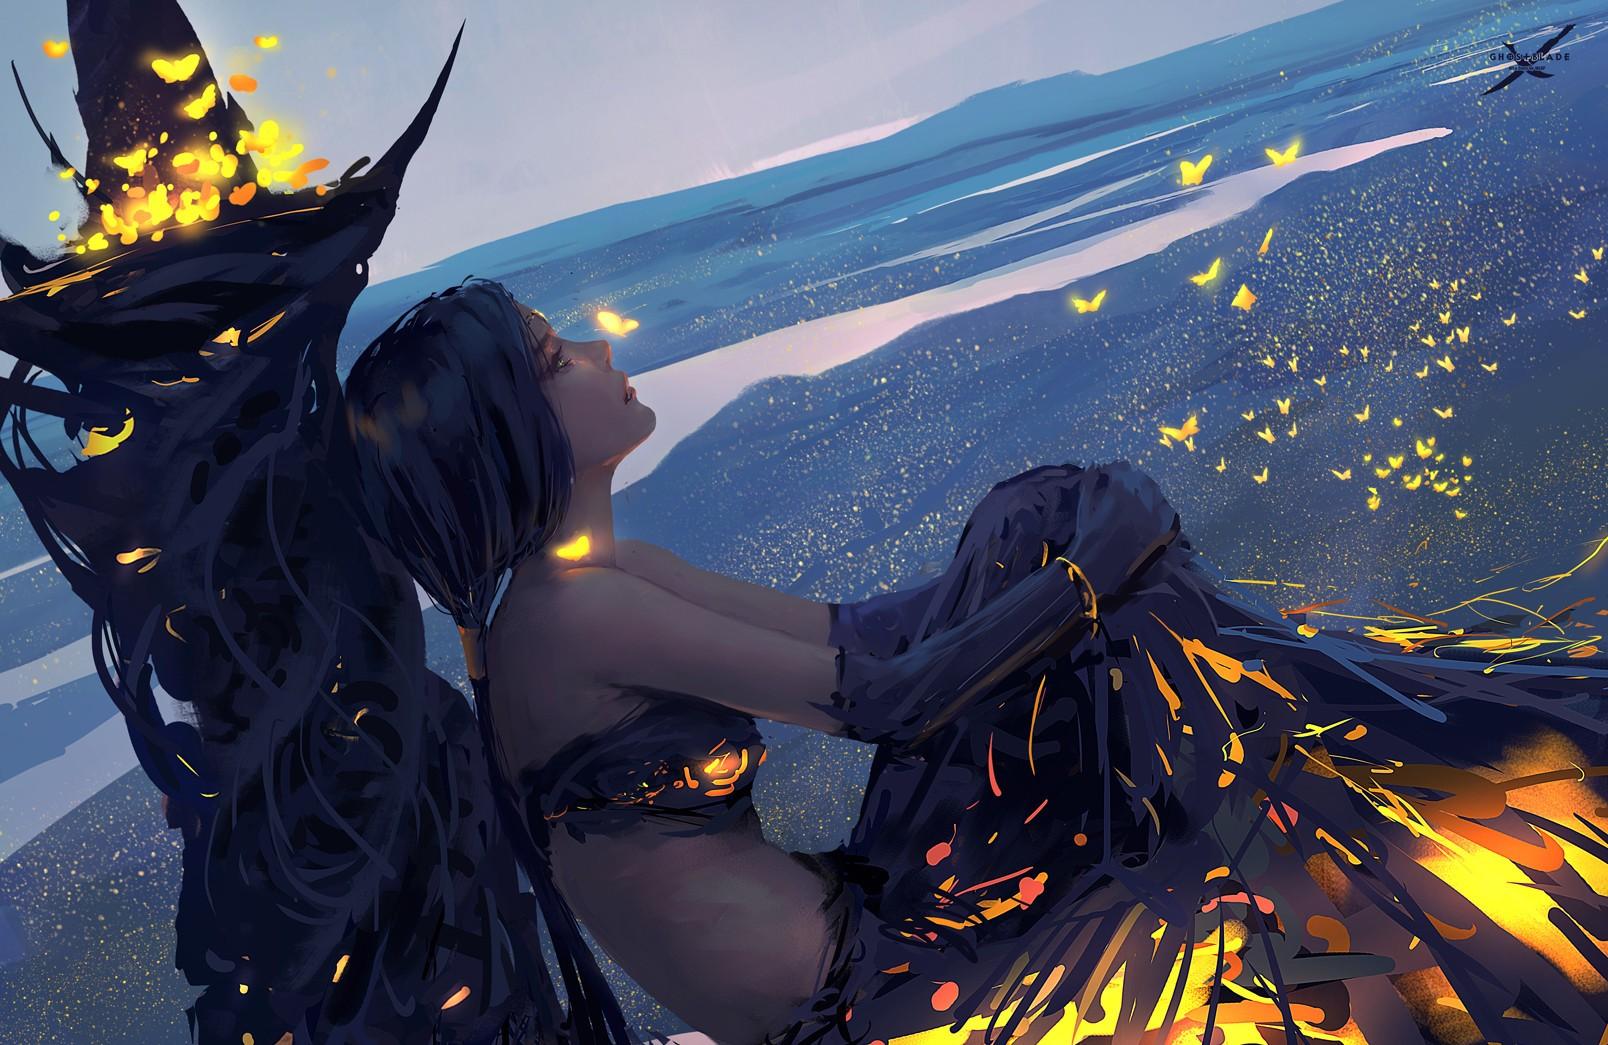 General 1608x1045 fantasy art fantasy girl artwork WLOP Ghostblade tube top landscape Ghost + Blade